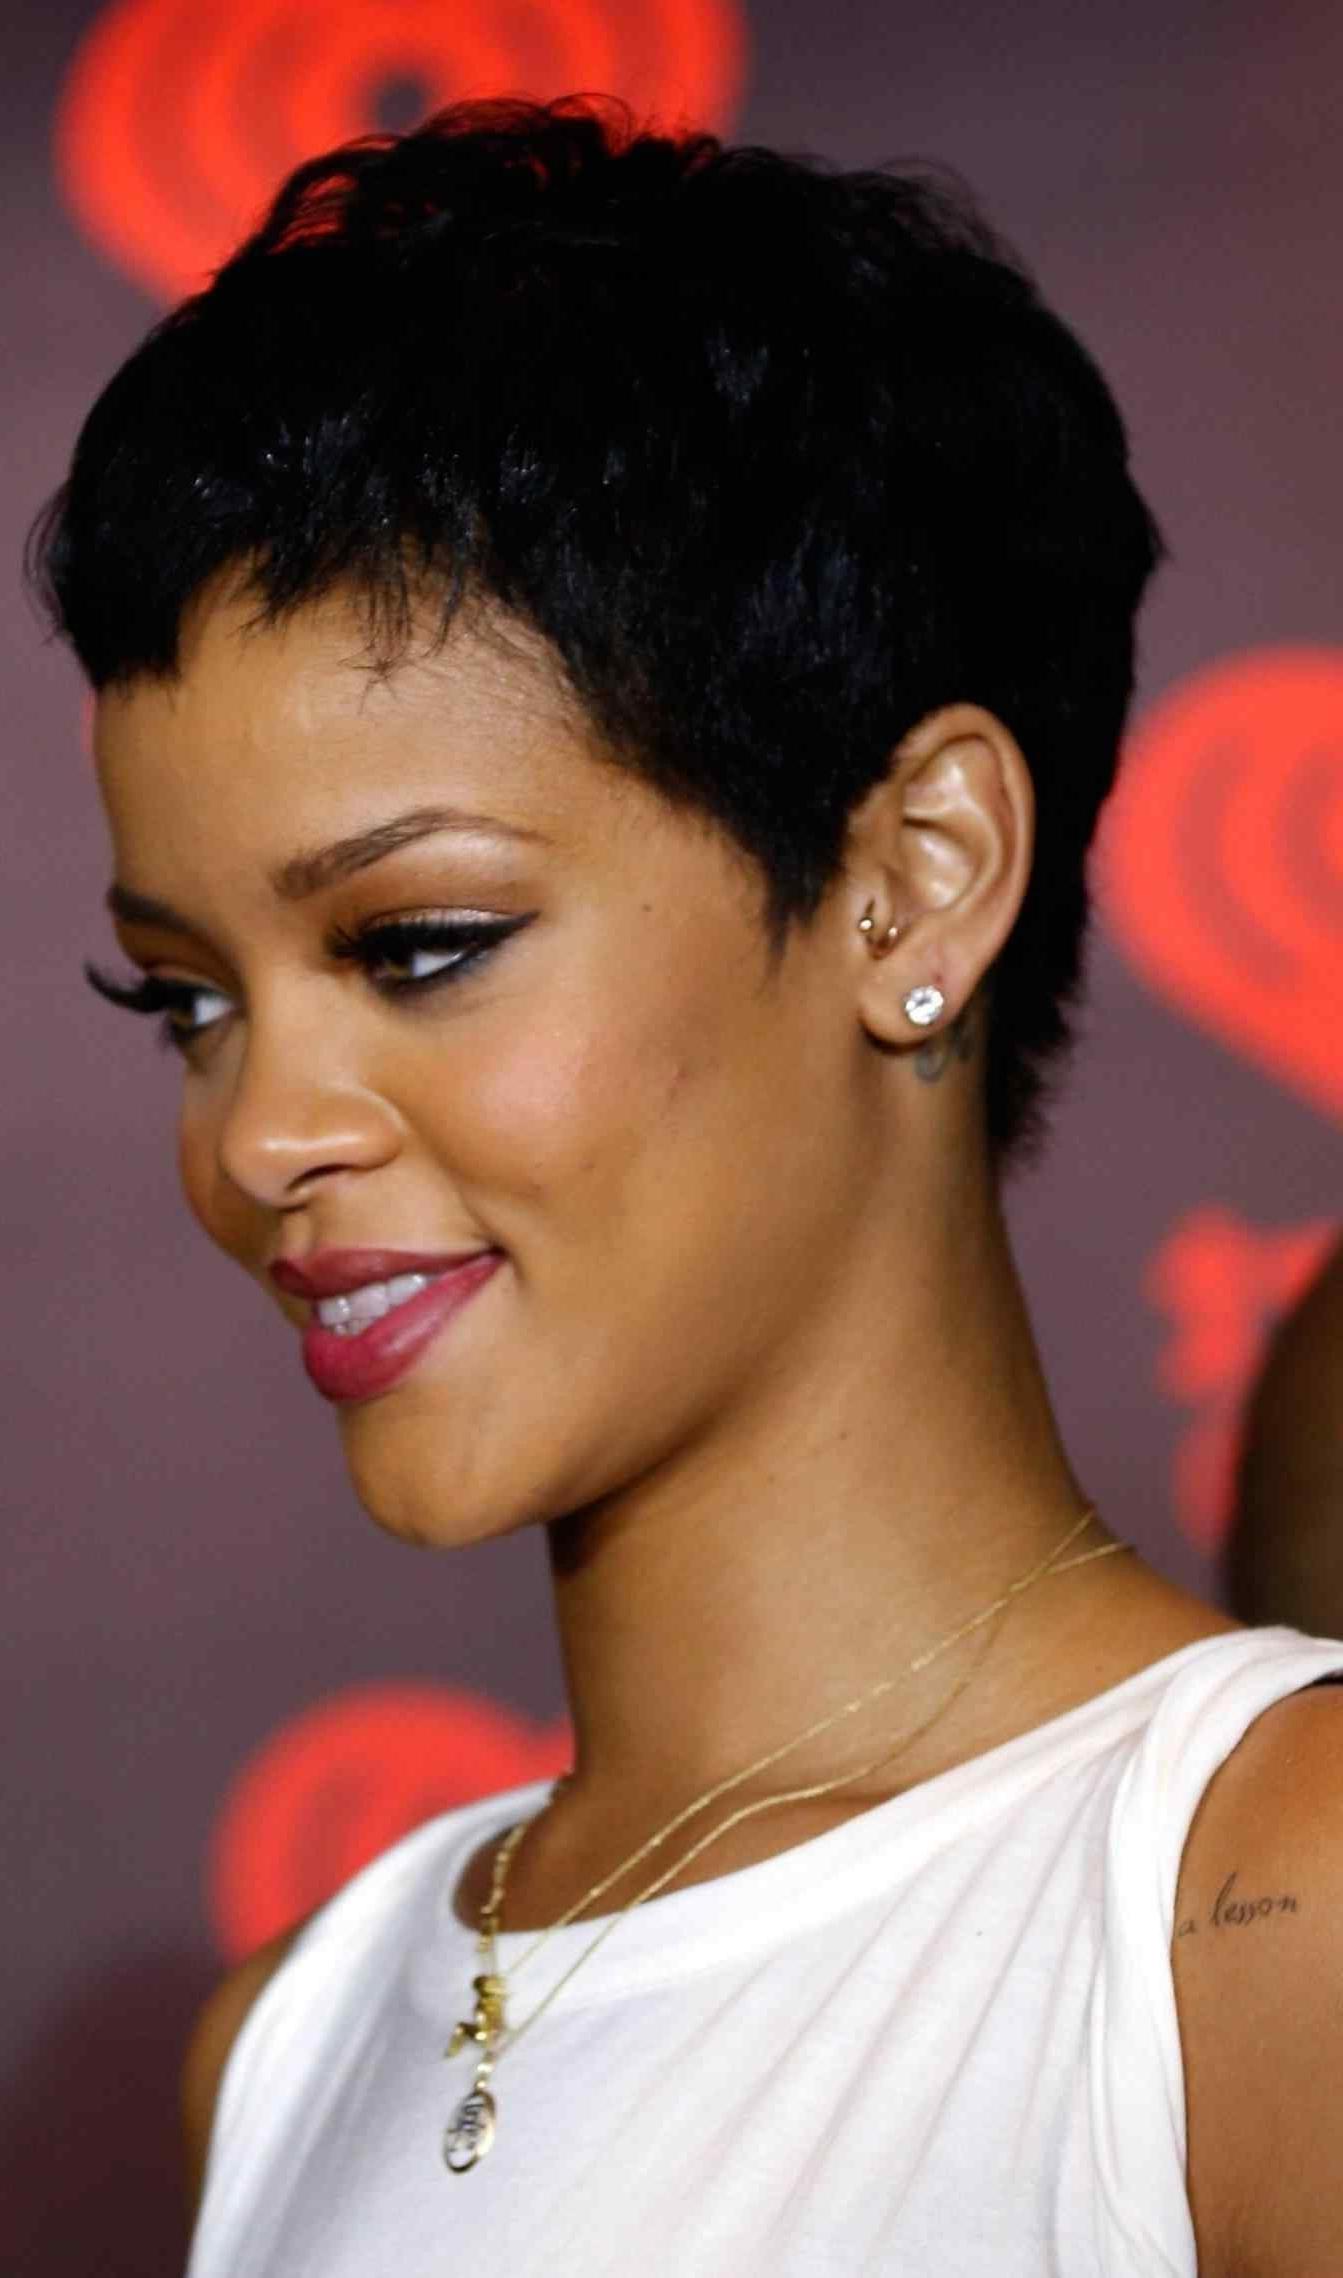 Brand New Short Hairstyles For Black Women With Oval Faces – Fresh Regarding Short Hairstyles For Black Women With Oval Faces (View 4 of 25)